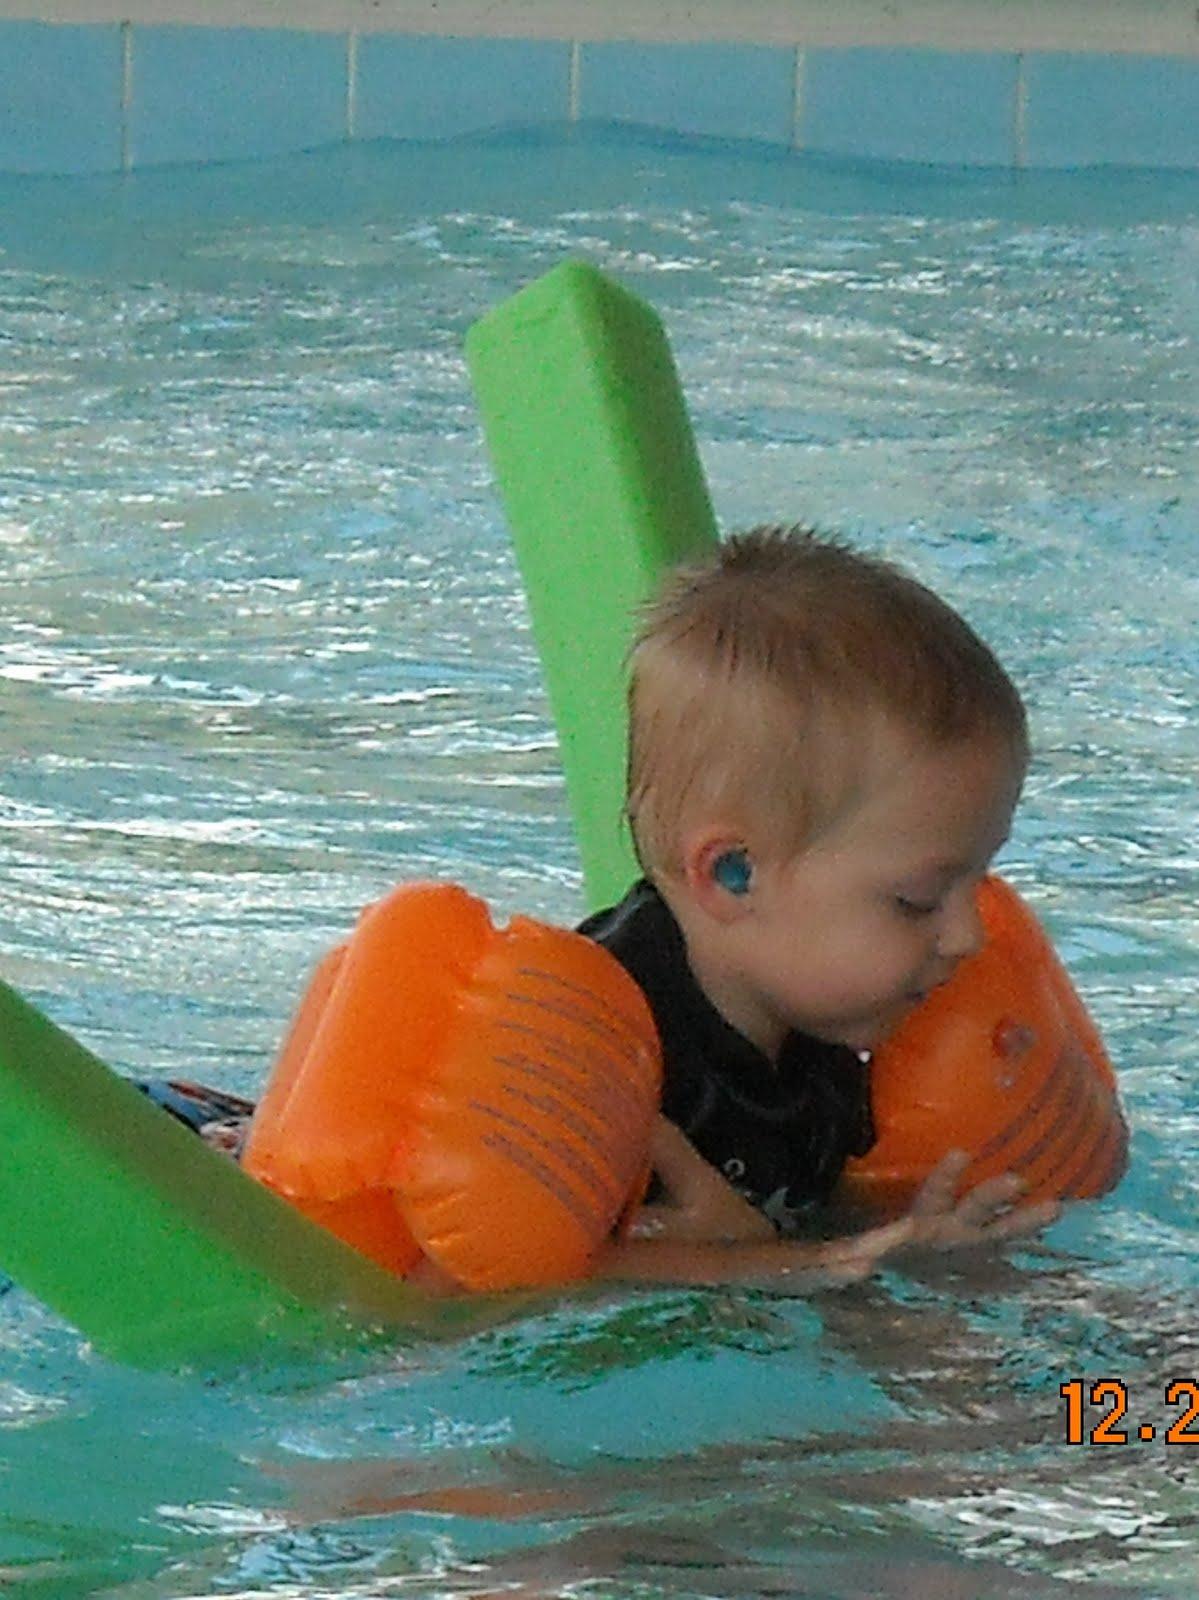 Joe Diane Mallery 39 S Big Adventure Modern Day Gypsies Pool Time With The Boy 39 S